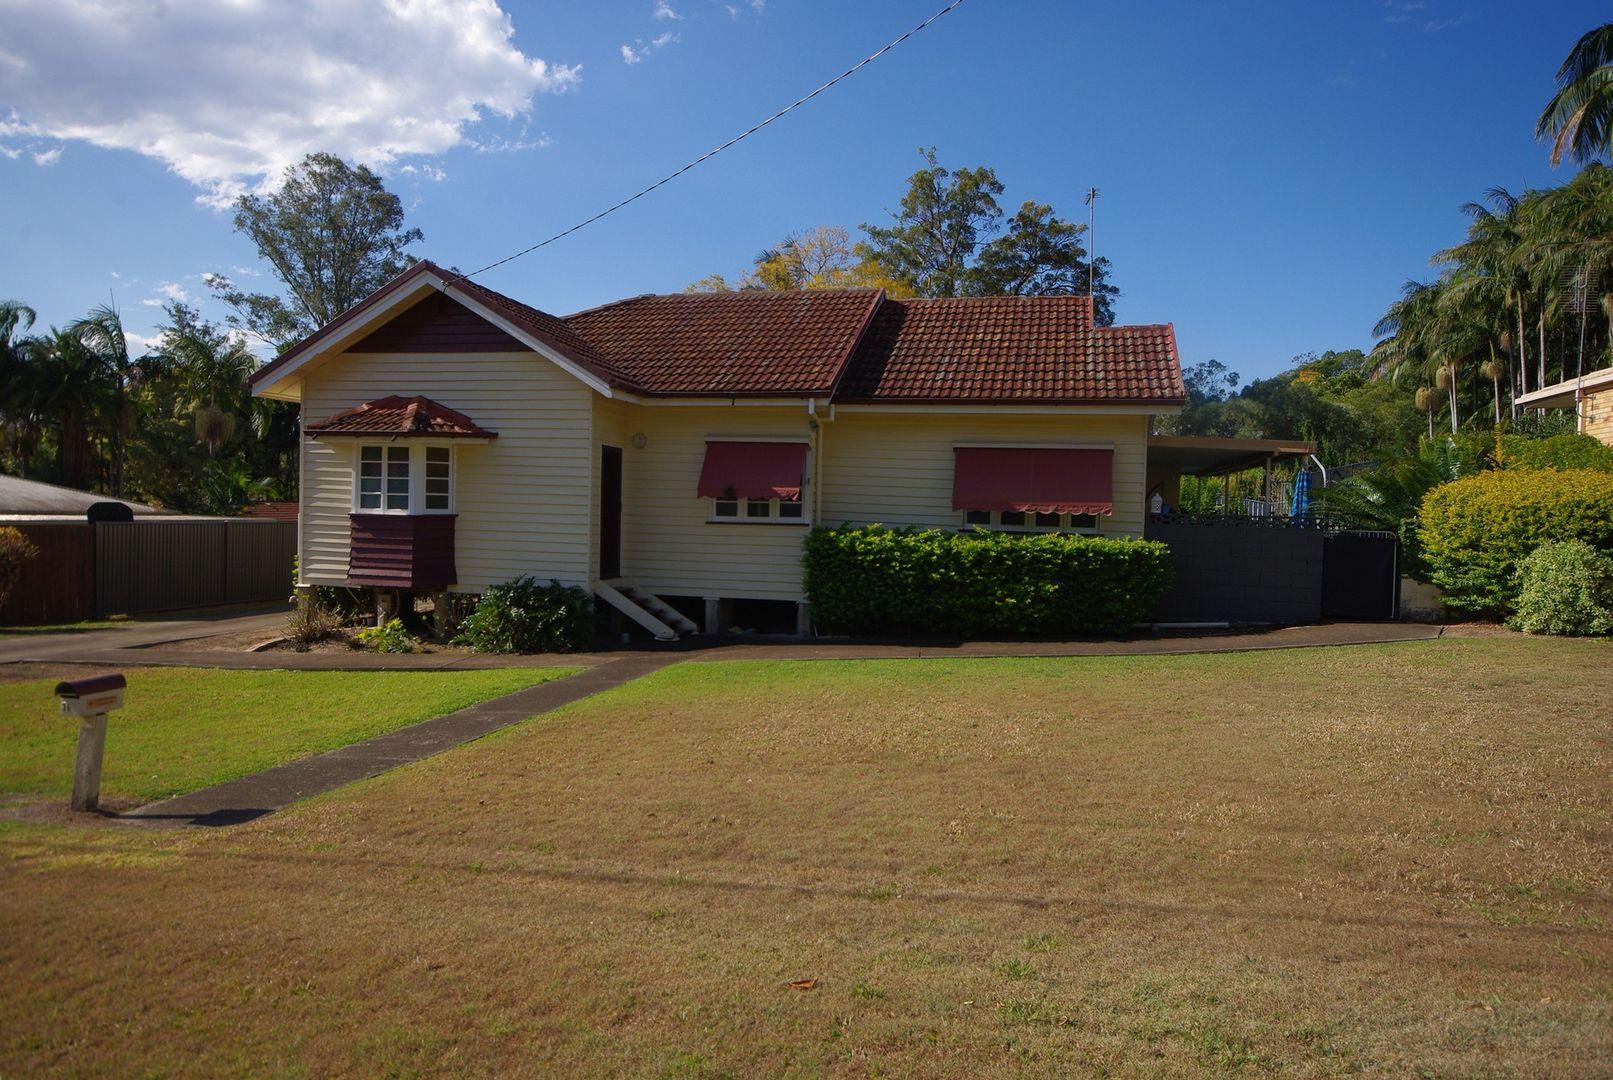 36-38 Appel Street, Canungra QLD 4275, Image 1